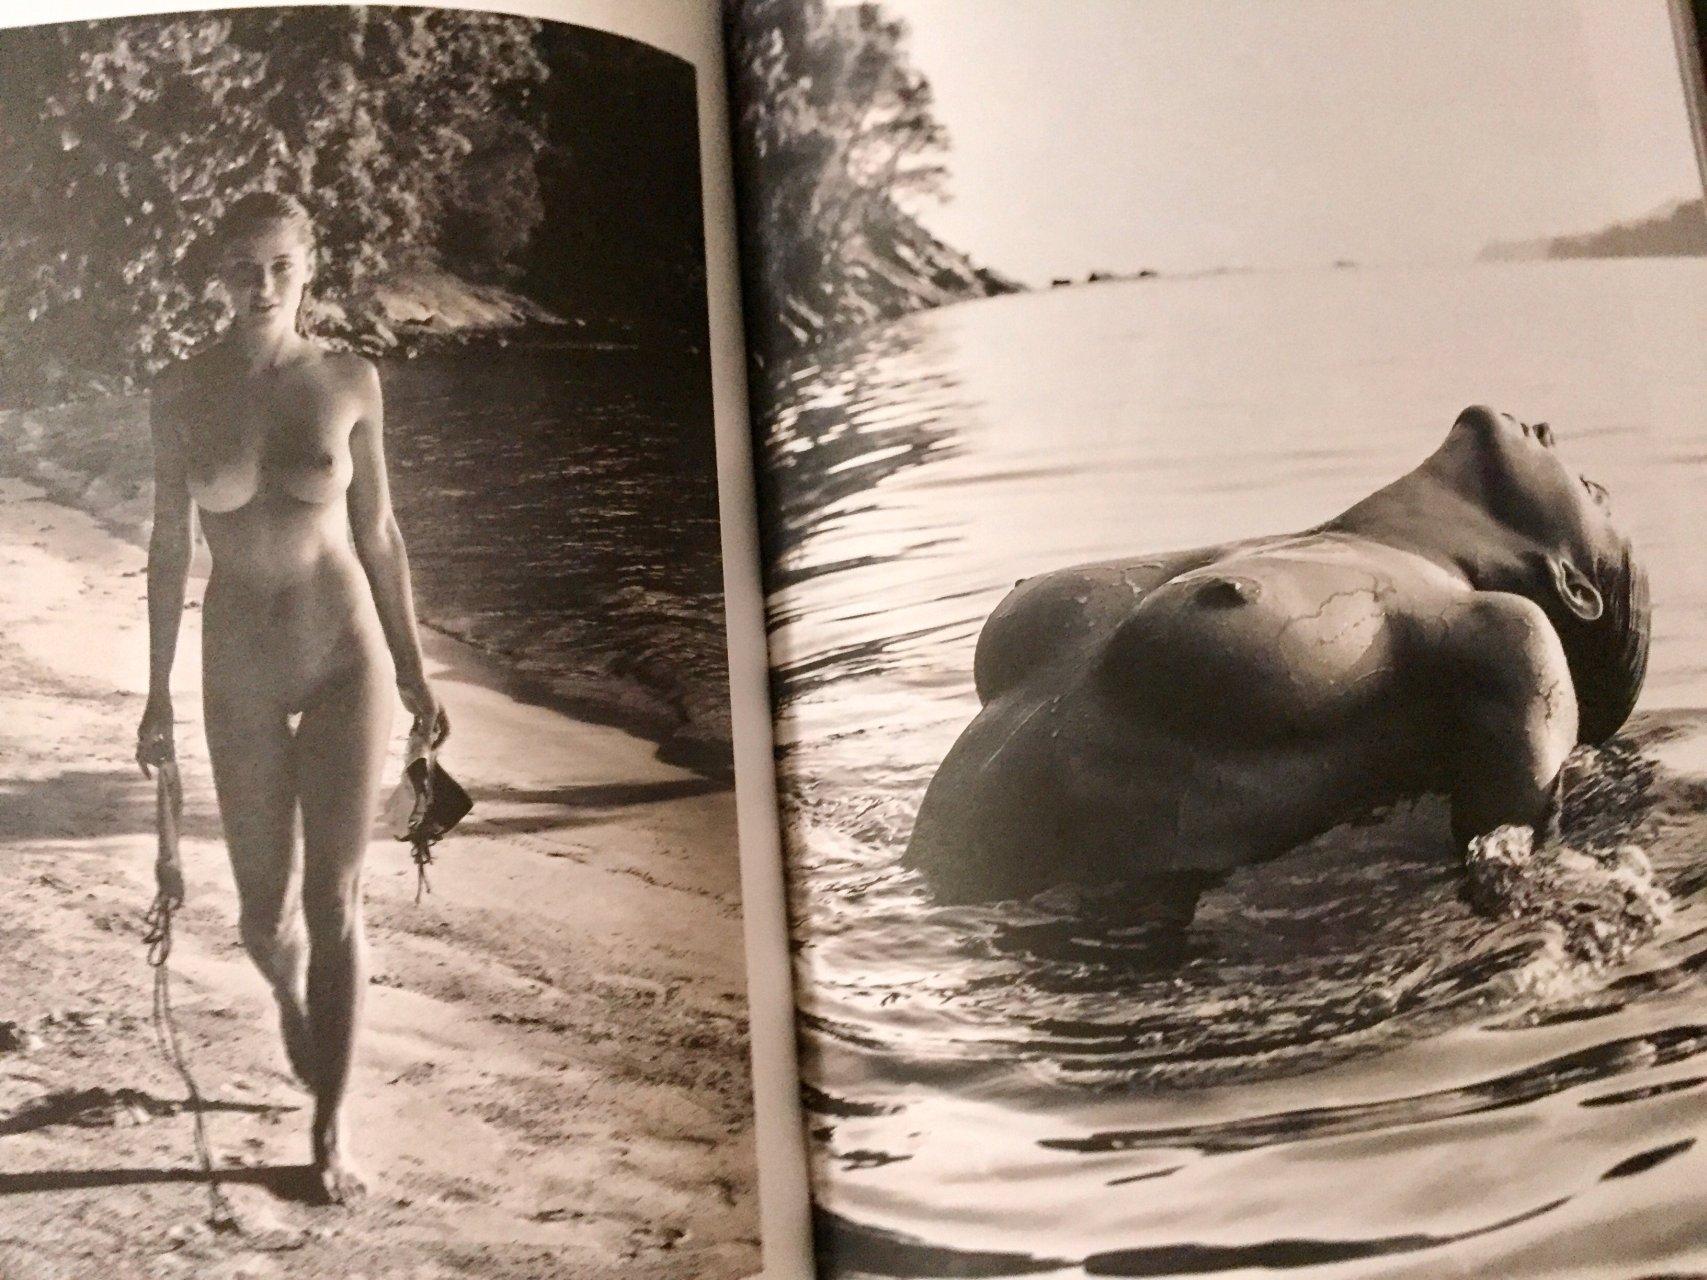 Helen flanagan nude leaked photos nude celebrity photos